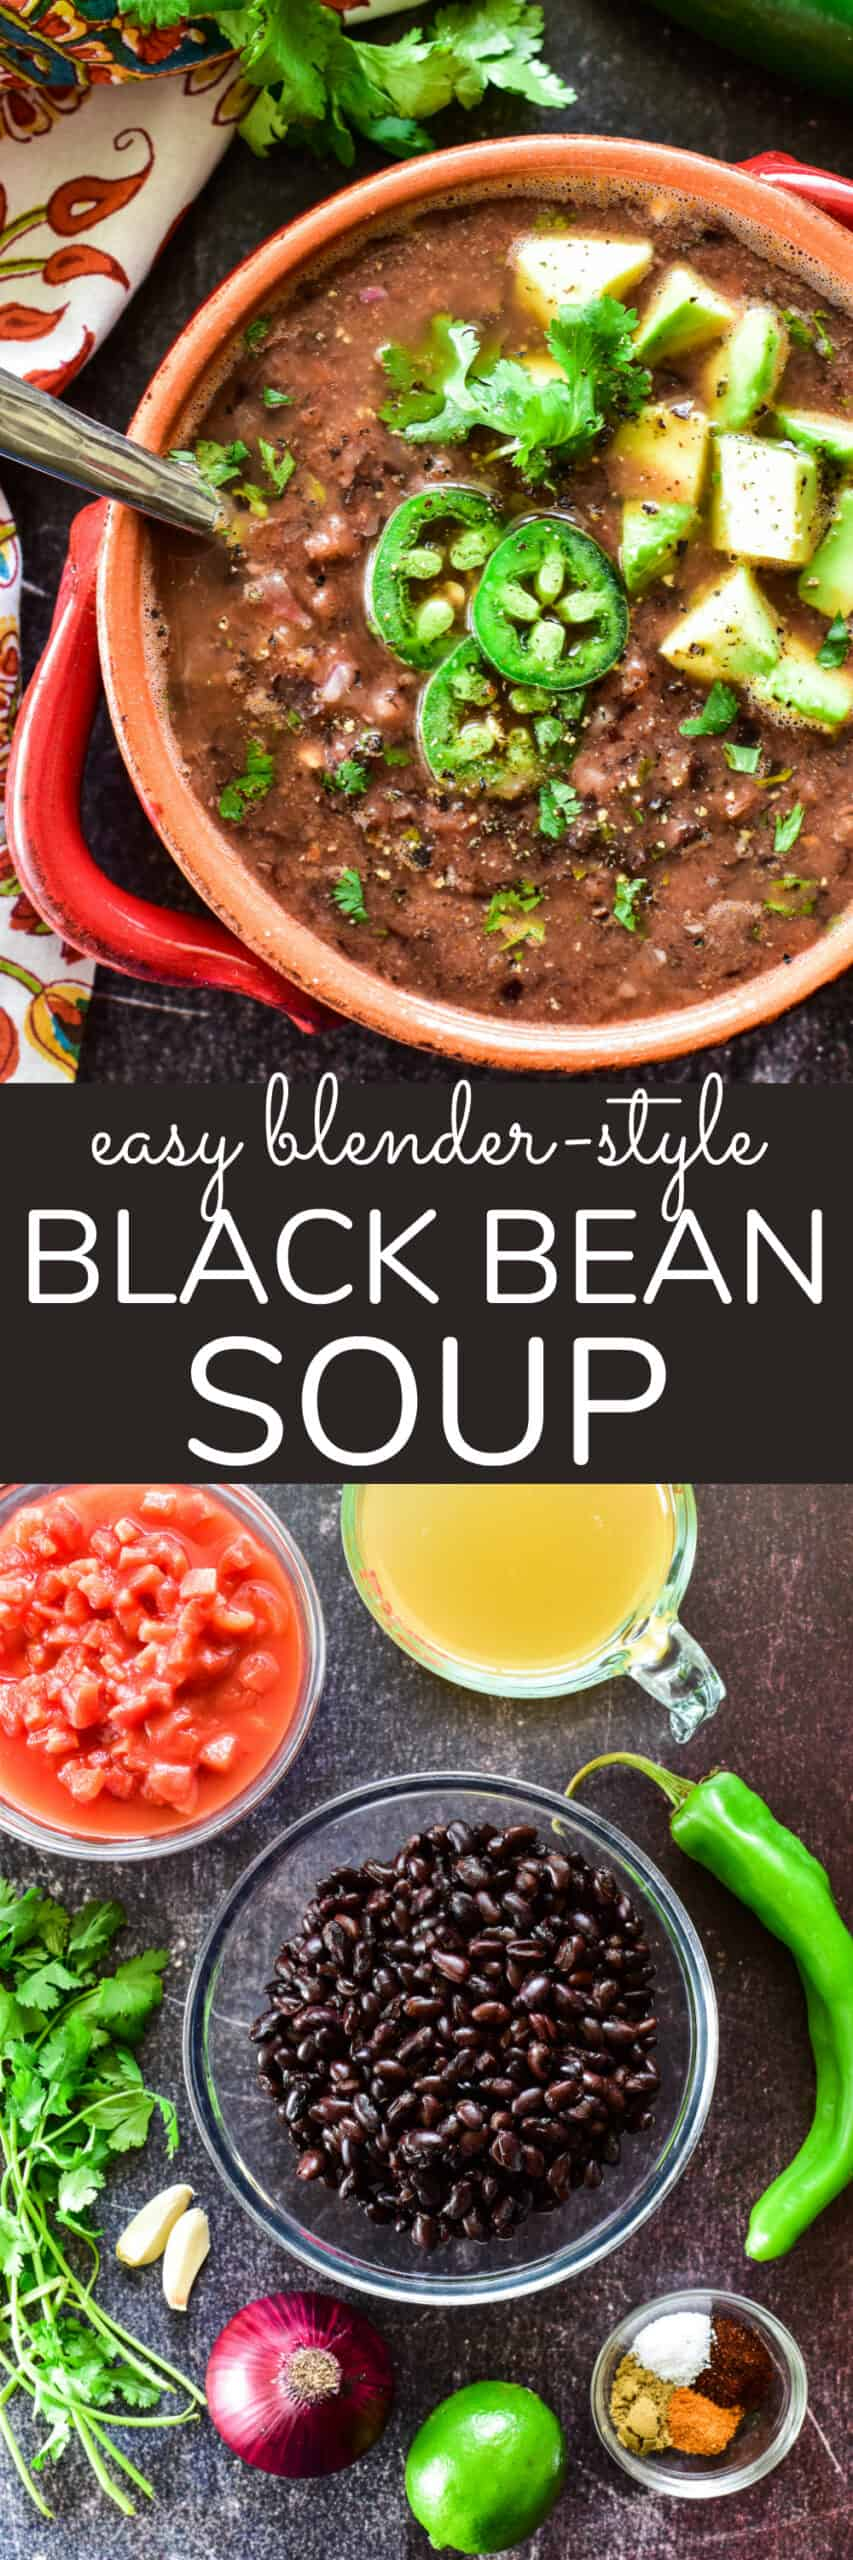 Collage image of Black Bean Soup & ingredients